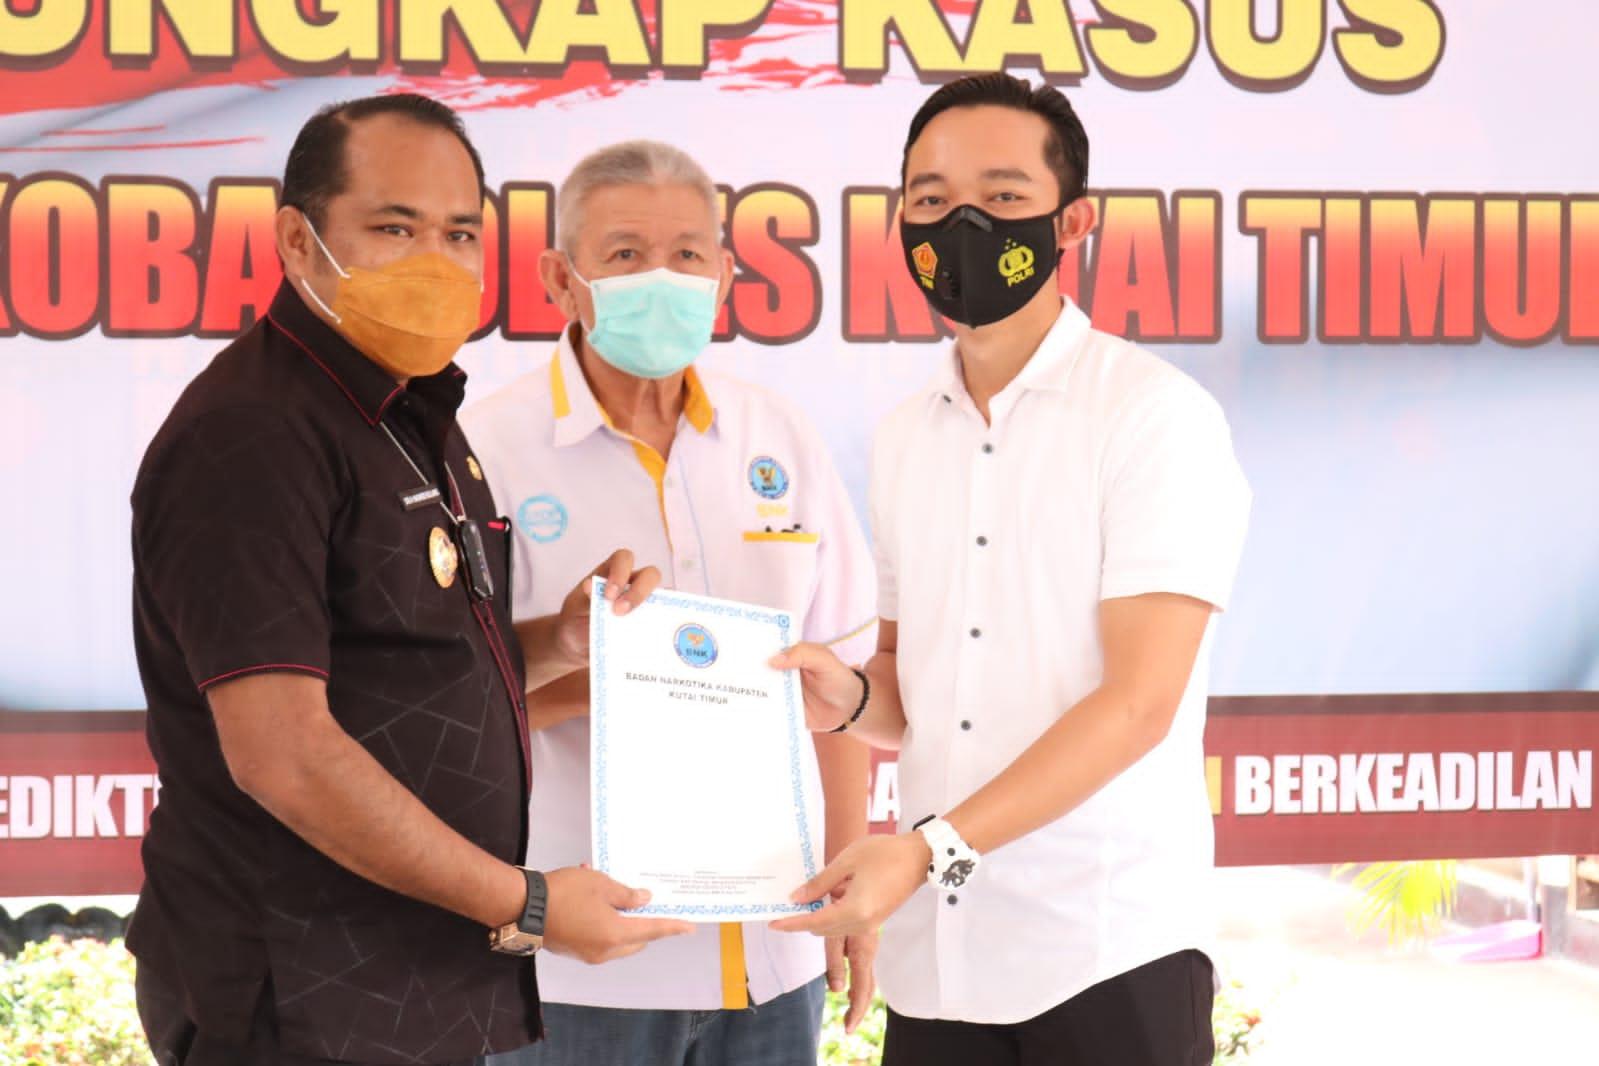 Ketua BNK Kasmidi Bulang Apresisasi Jerih Payah Polres Kutim Dalam Mengungkap Peredaran Narkoba Jenis Shabu 4 Kg